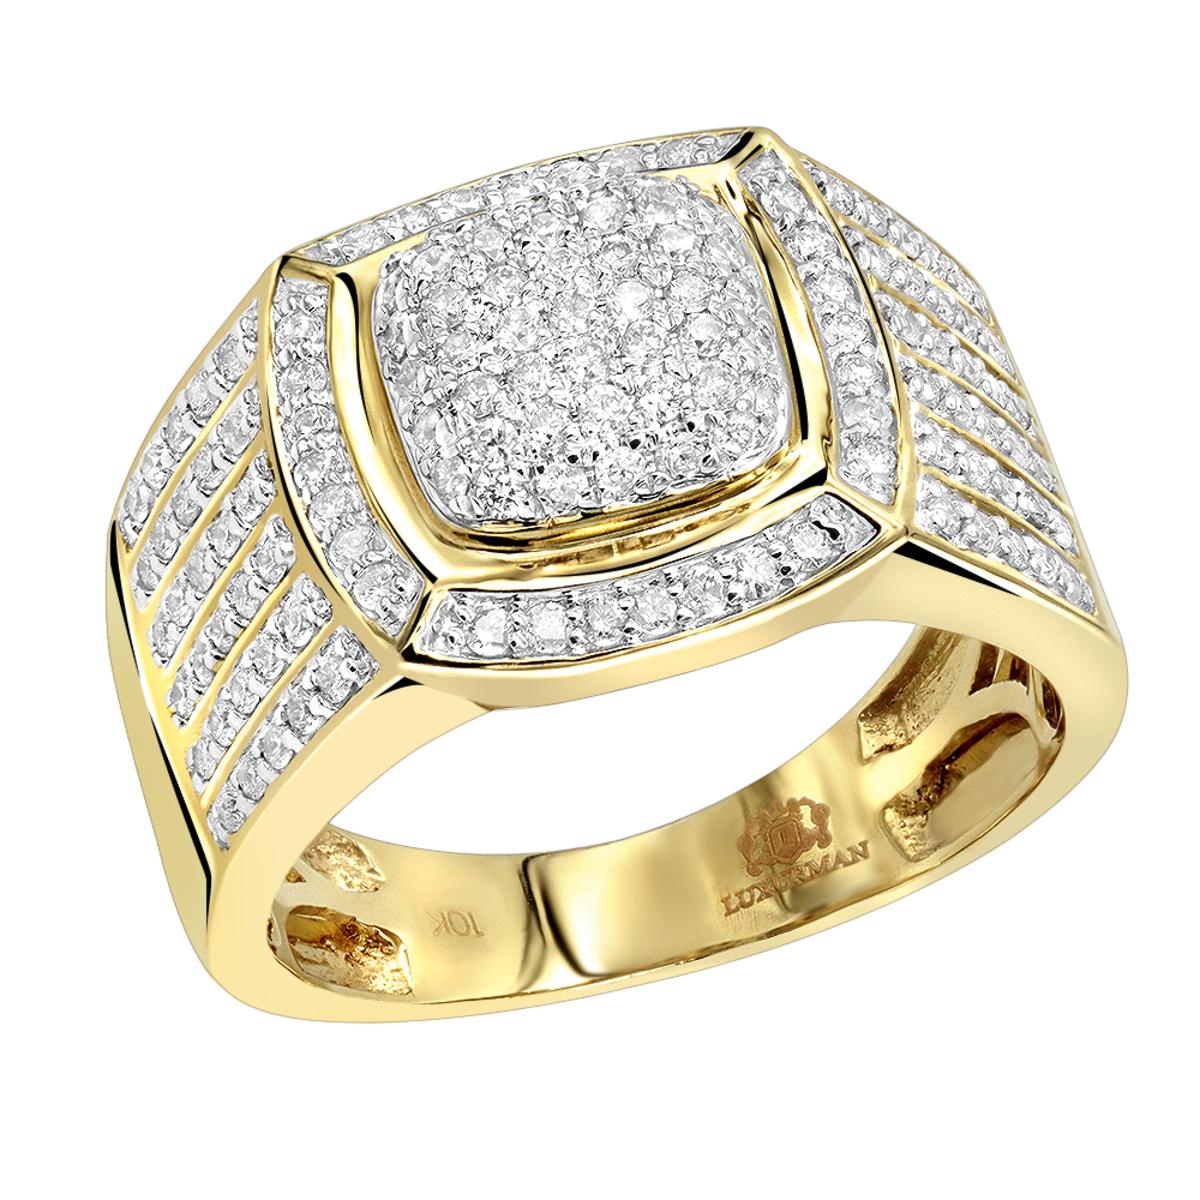 Pinky Rings: 1 Carat Men's Diamond Ring by Luxurman